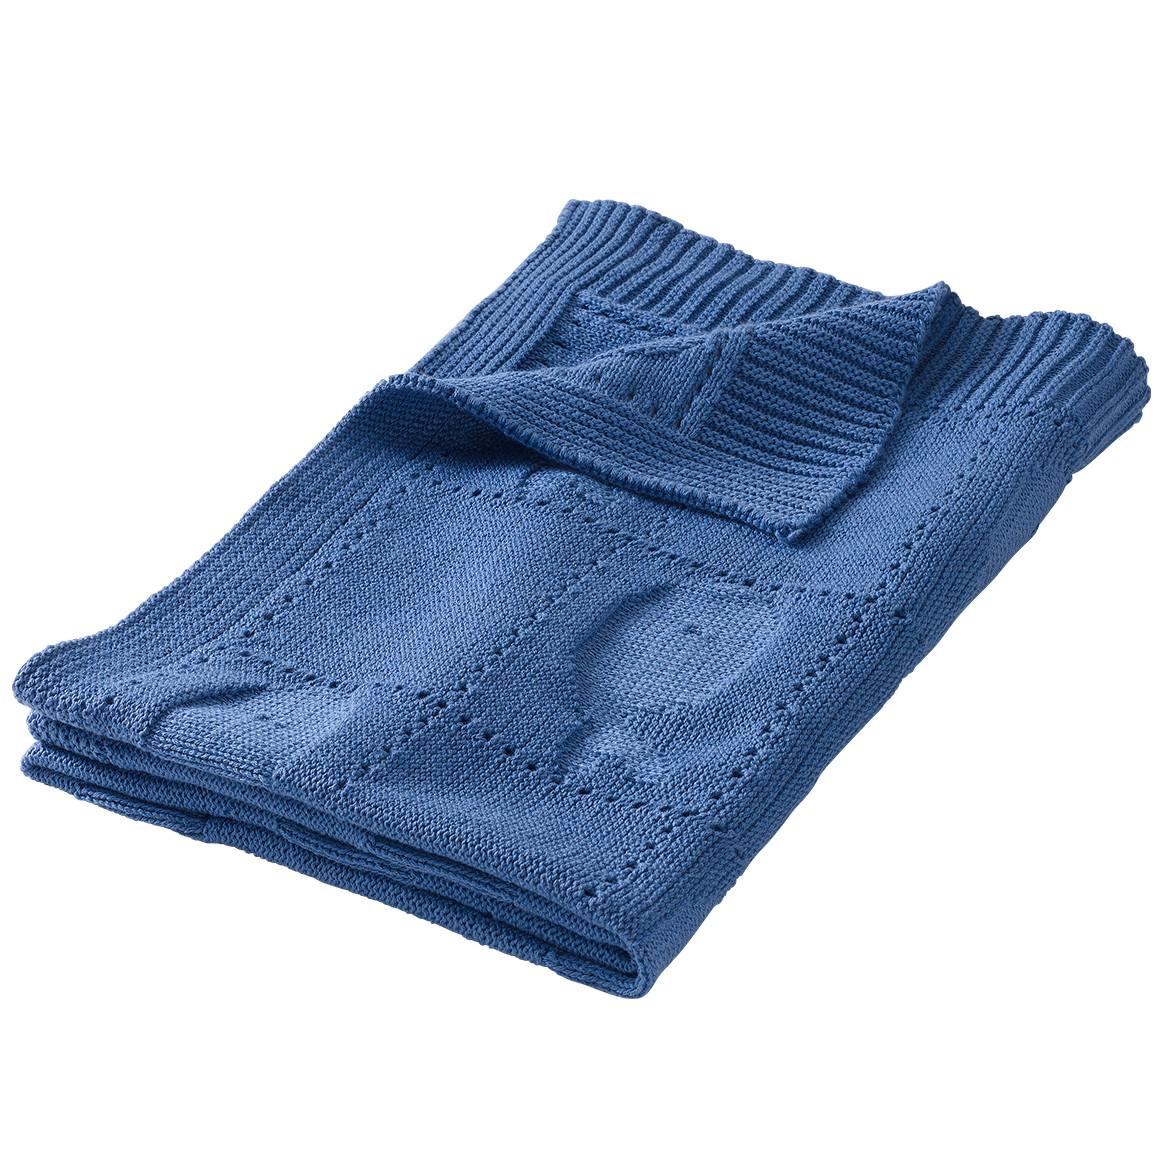 blaue Strickdecke